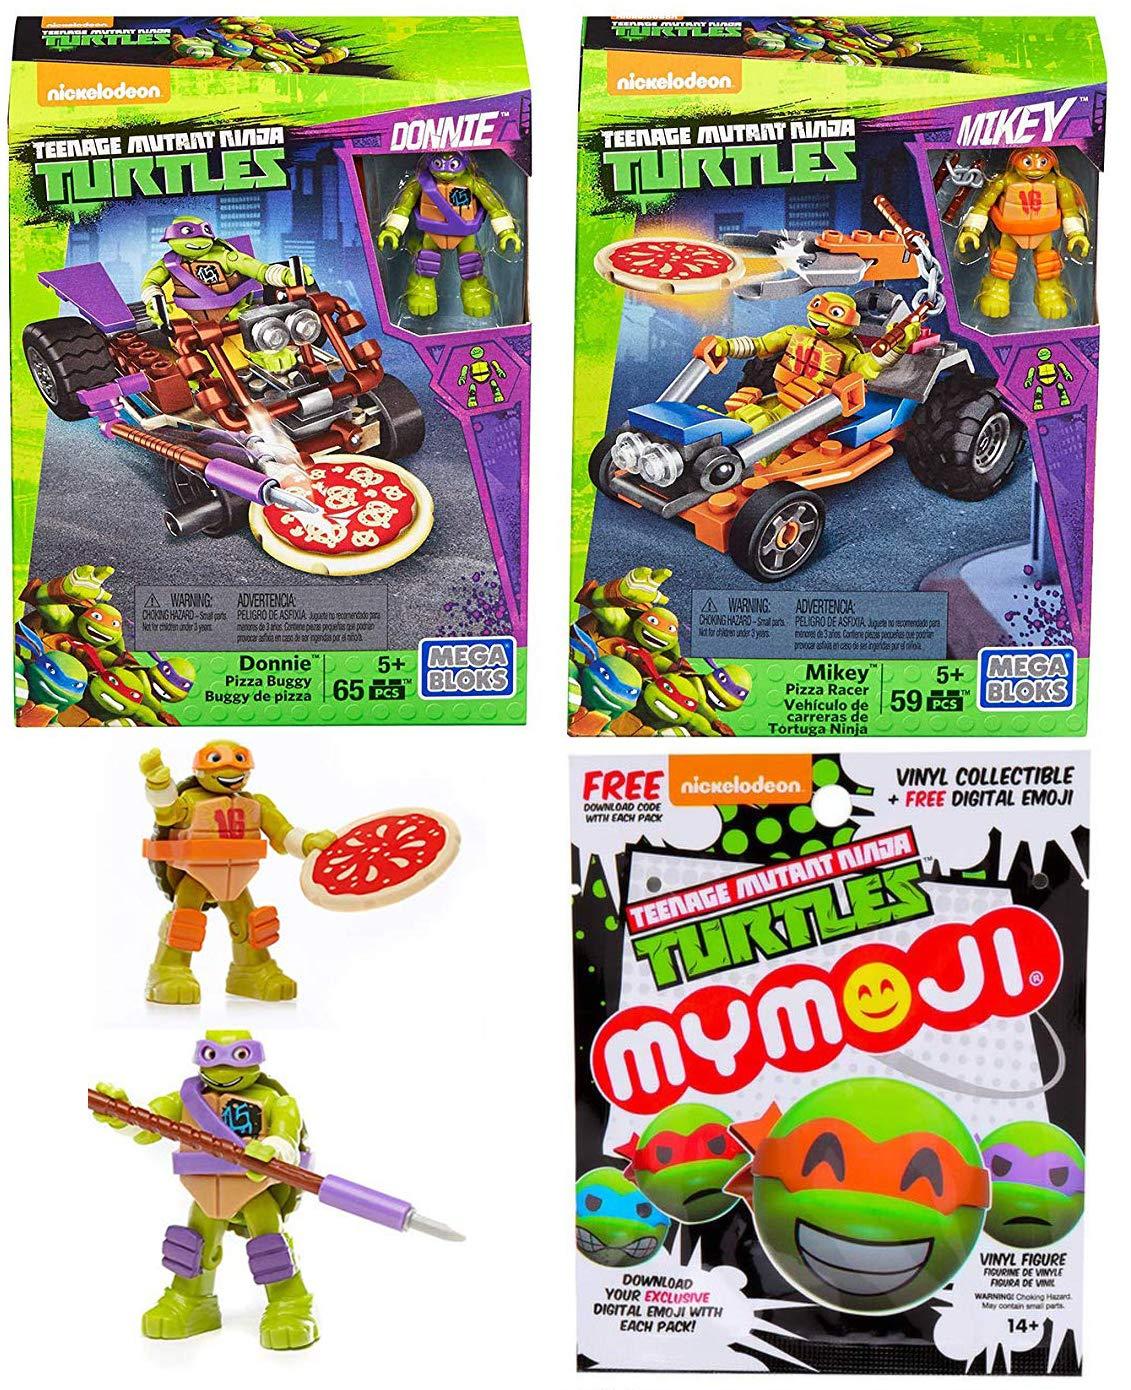 Mymoji TMNT Vinyl Blind Bag Bundled with Pizza Blast Buildable Mega Pack Teenage Mutant Ninja Turtles Cars & Mini Figure & Accessory Comic Bundle + Donnie Buggy / Mickey Racer 3 Items